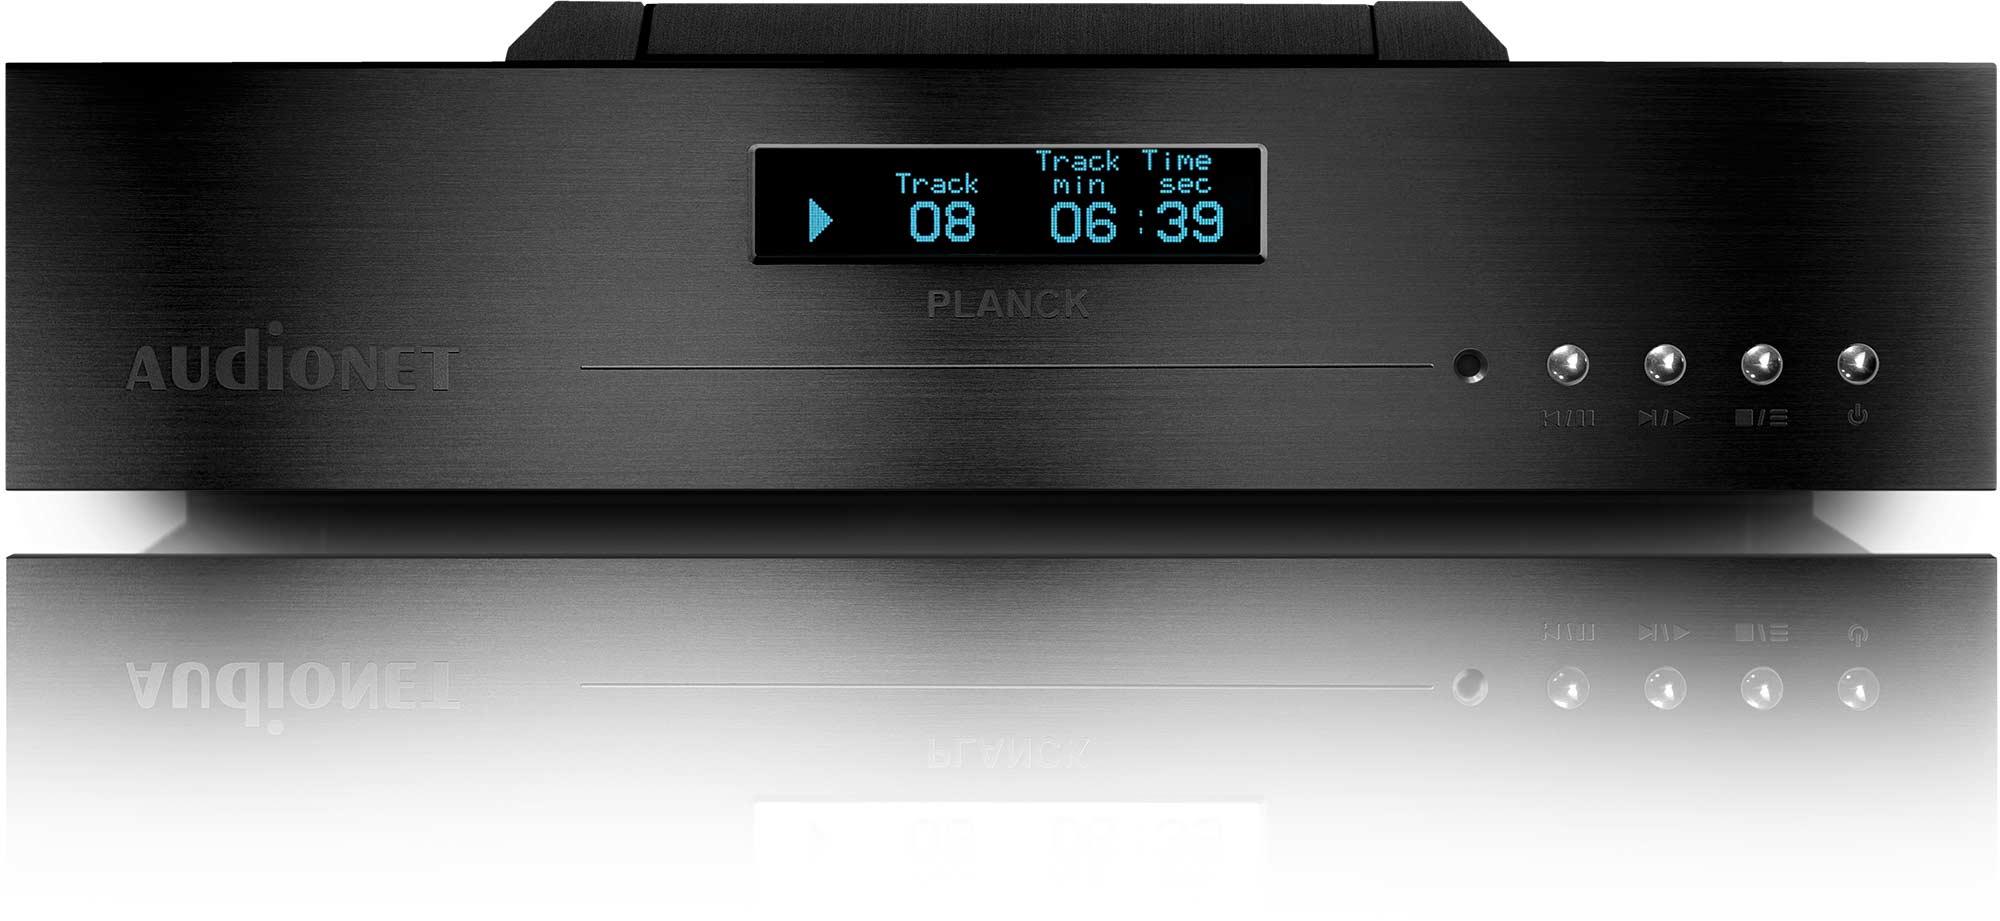 planck-2000